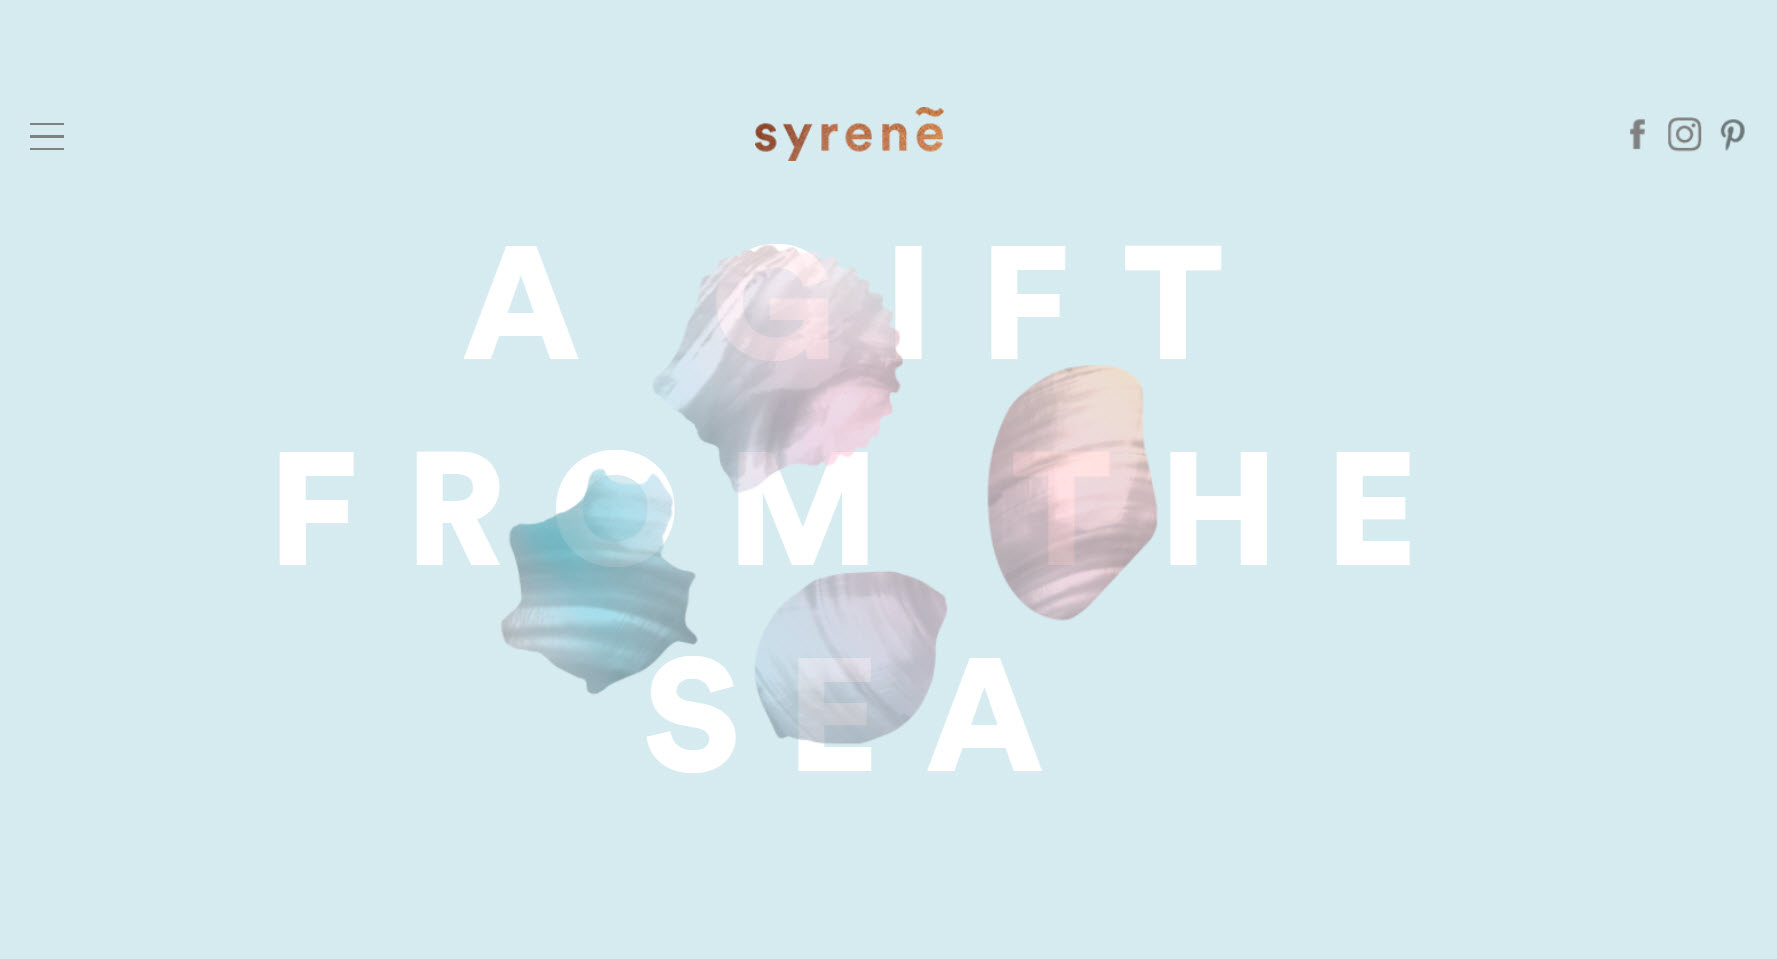 Syrene